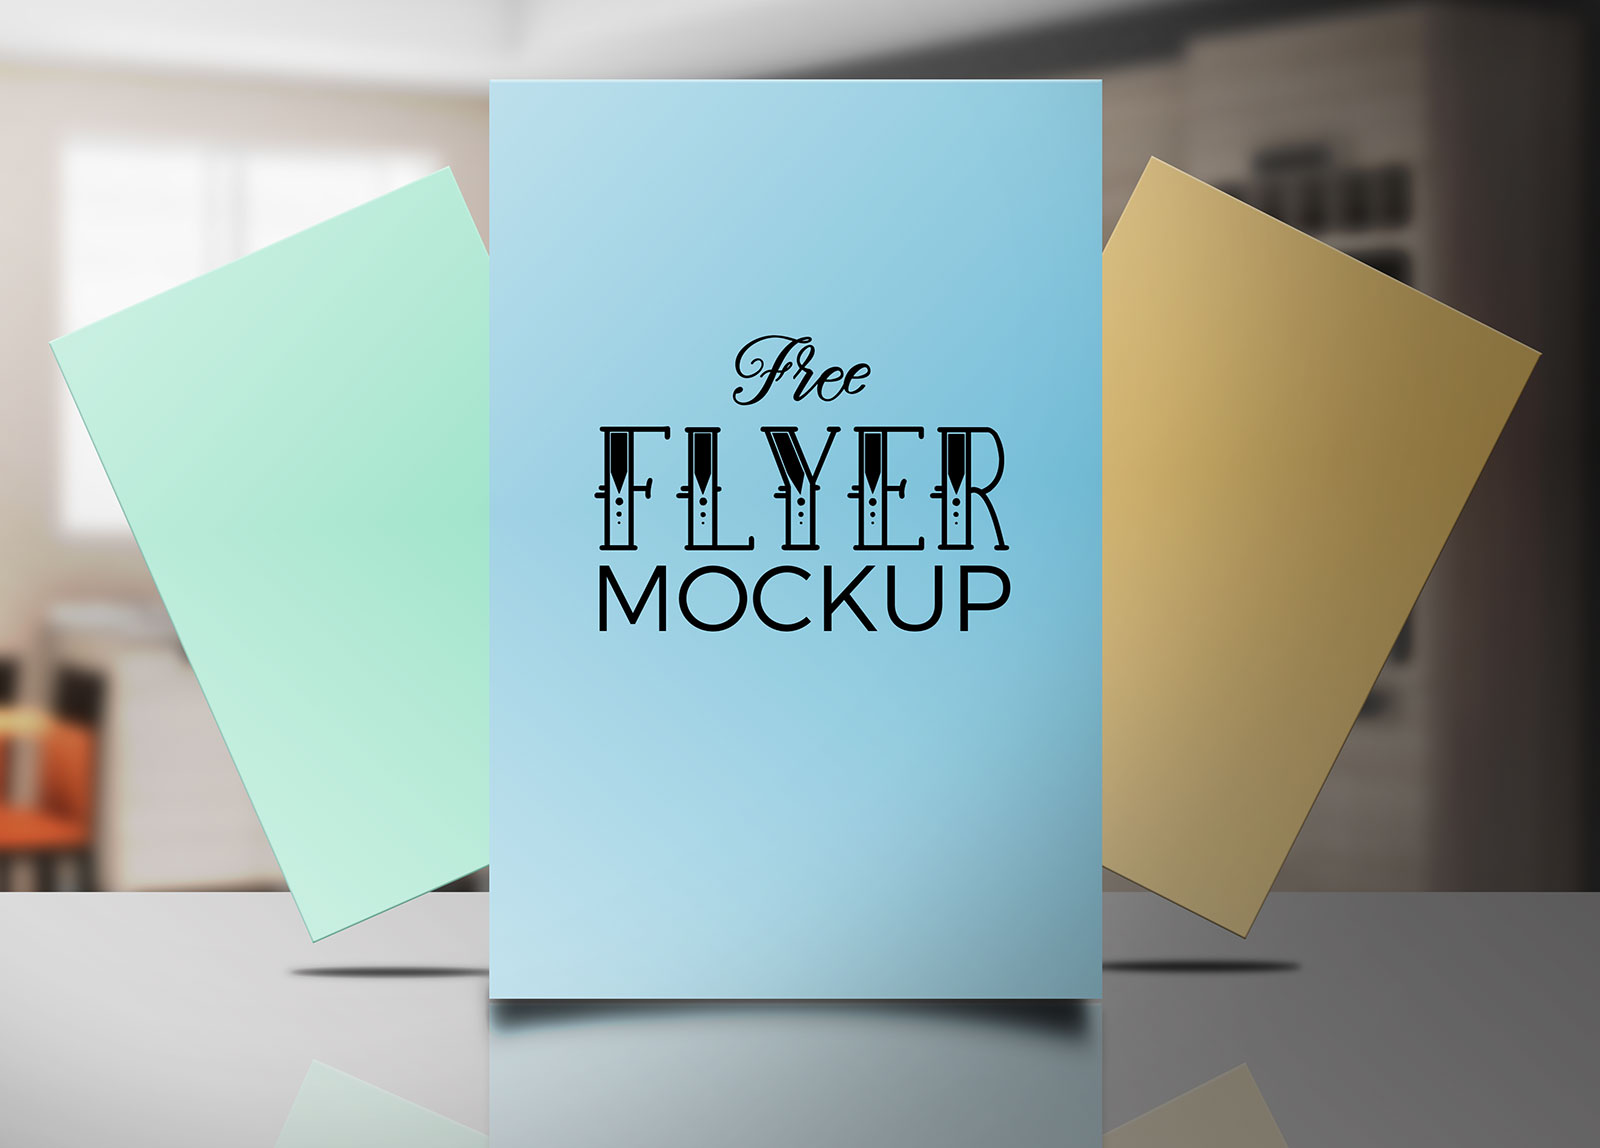 Free-Flyer-Poster-Mockup-PSD-file